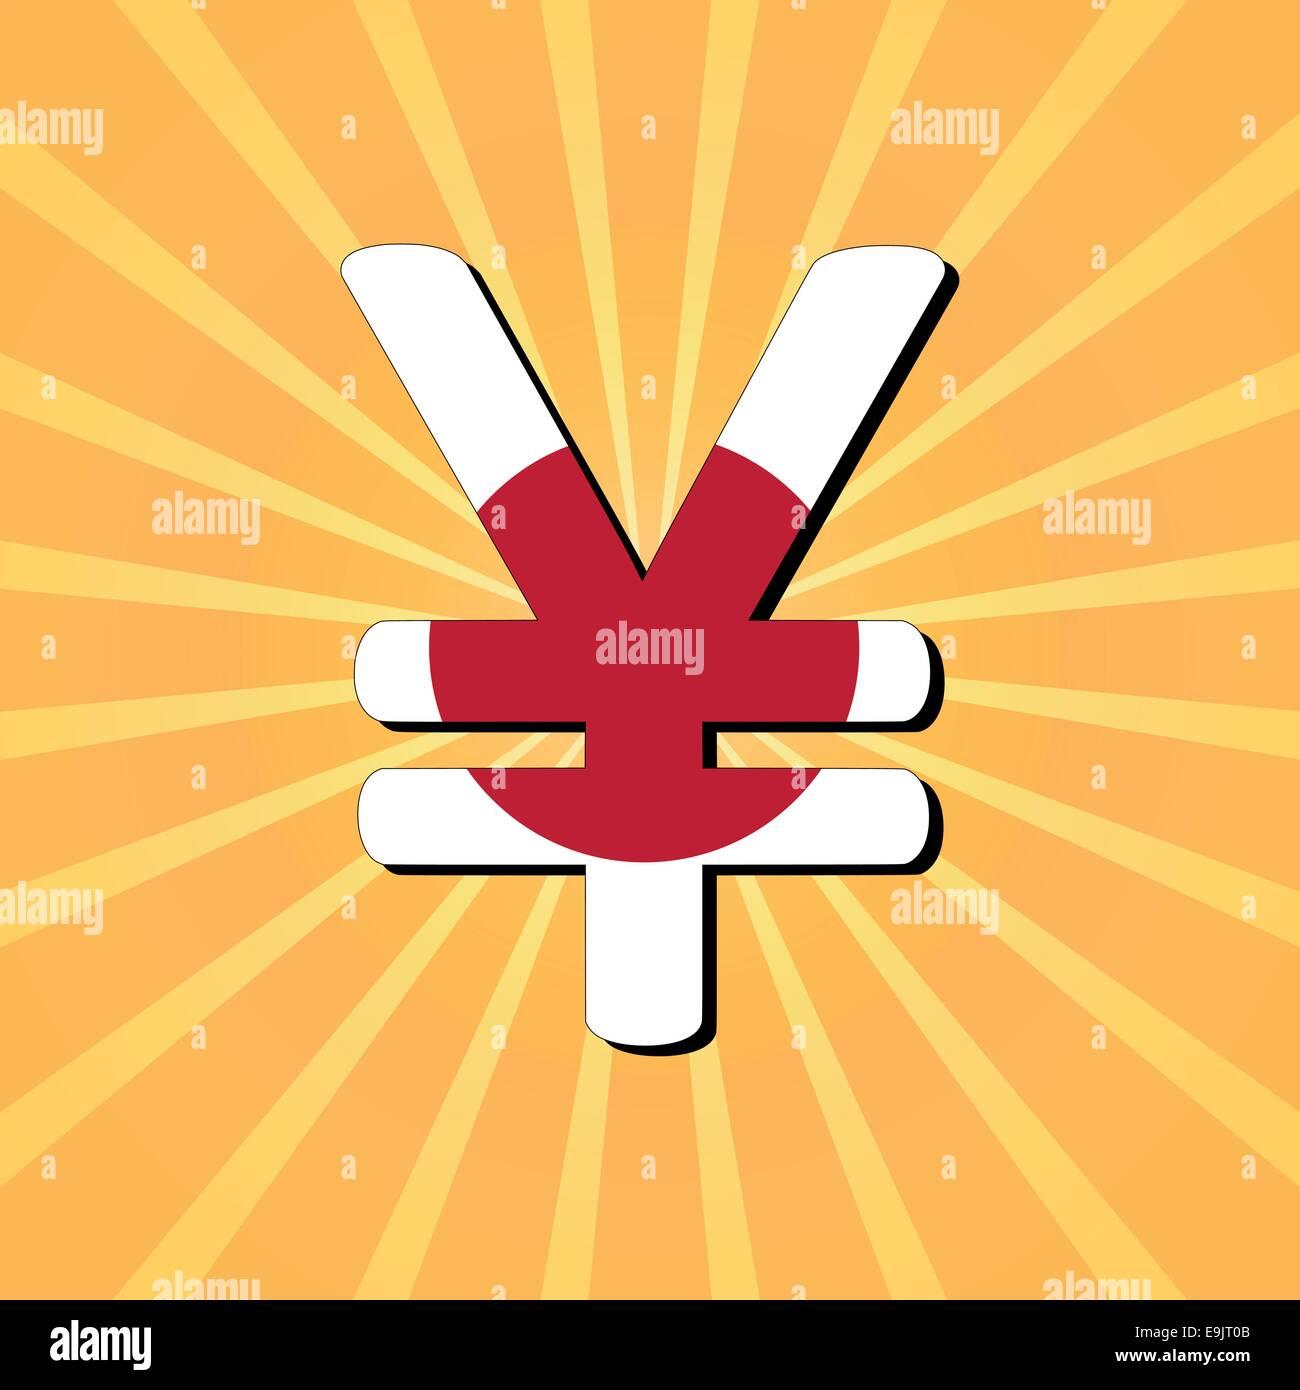 Japanese yen symbol on sunburst illustration stock vector art japanese yen symbol on sunburst illustration biocorpaavc Choice Image